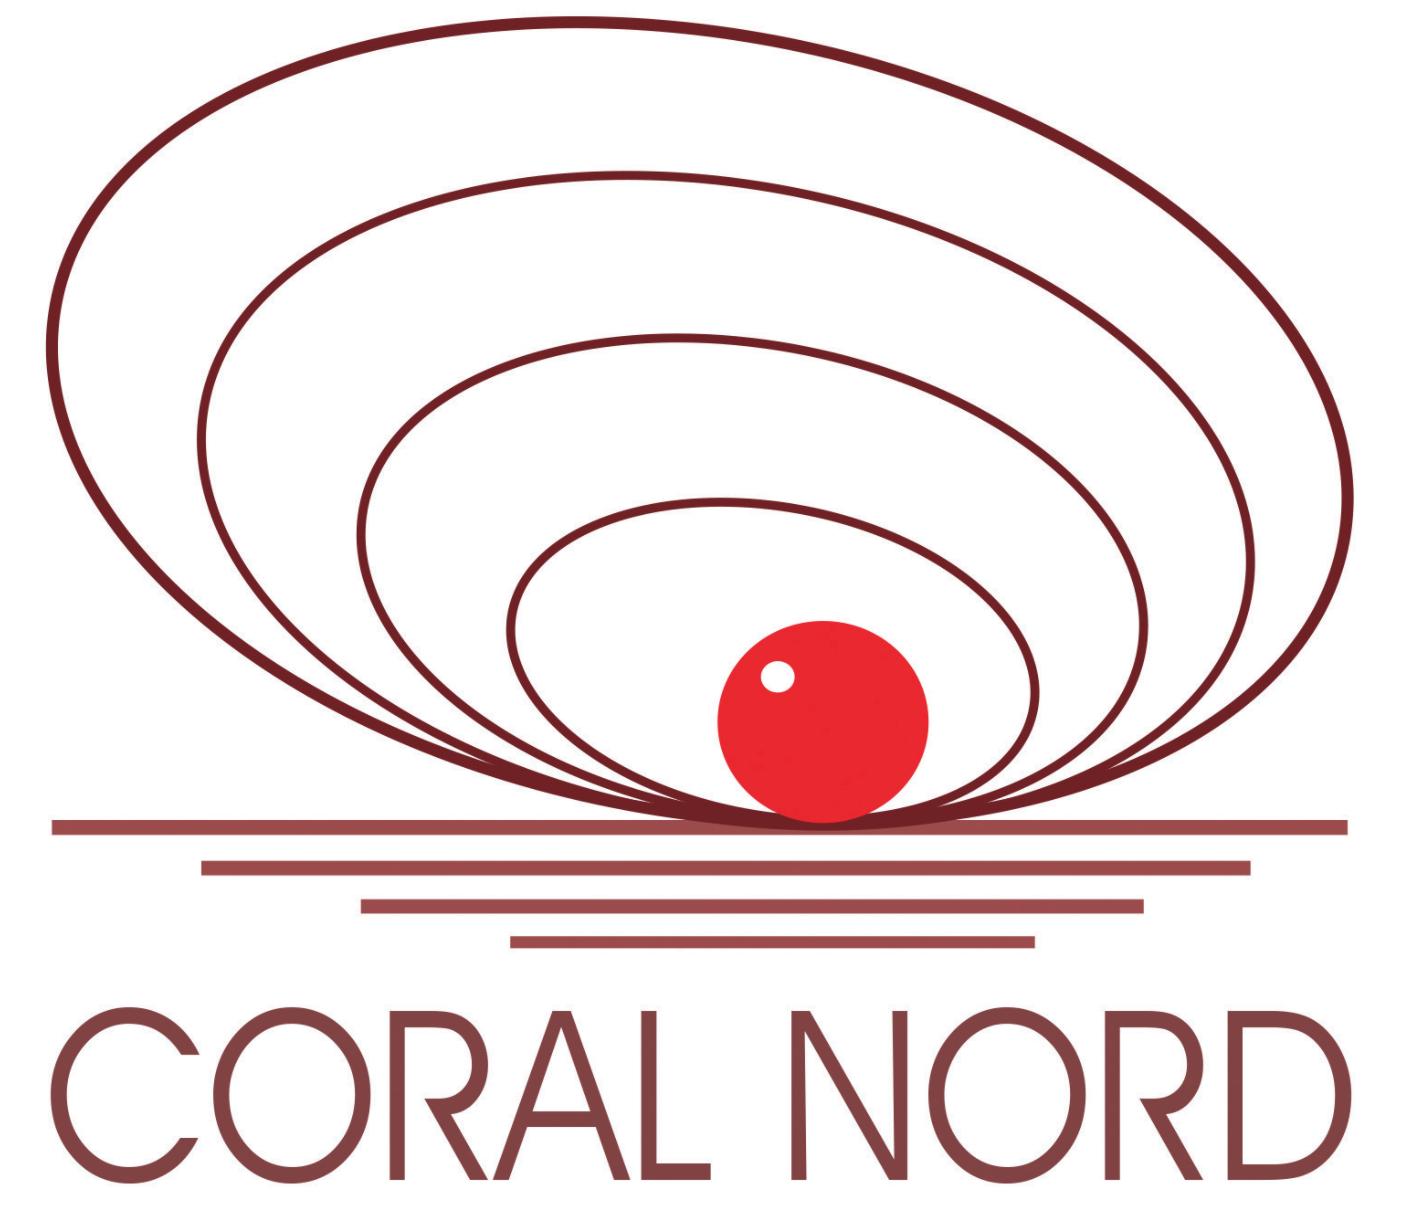 Coralnord.com